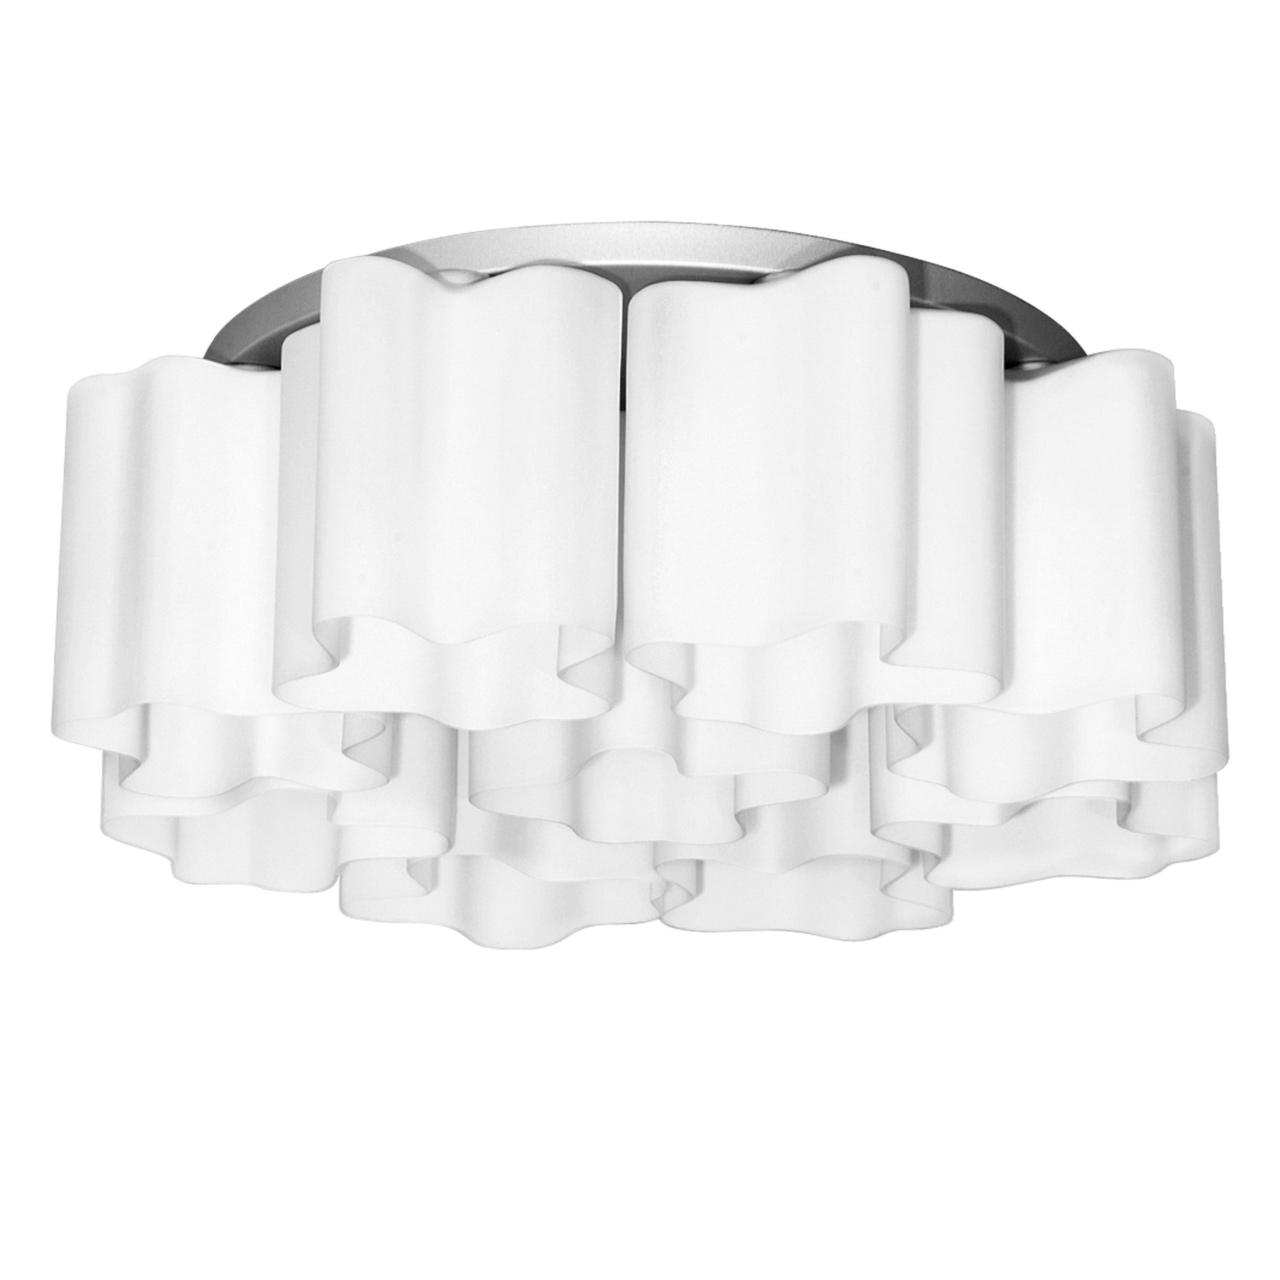 Люстра потолочная Nubi 9х40W E27 белый/ хром Lightstar 802090